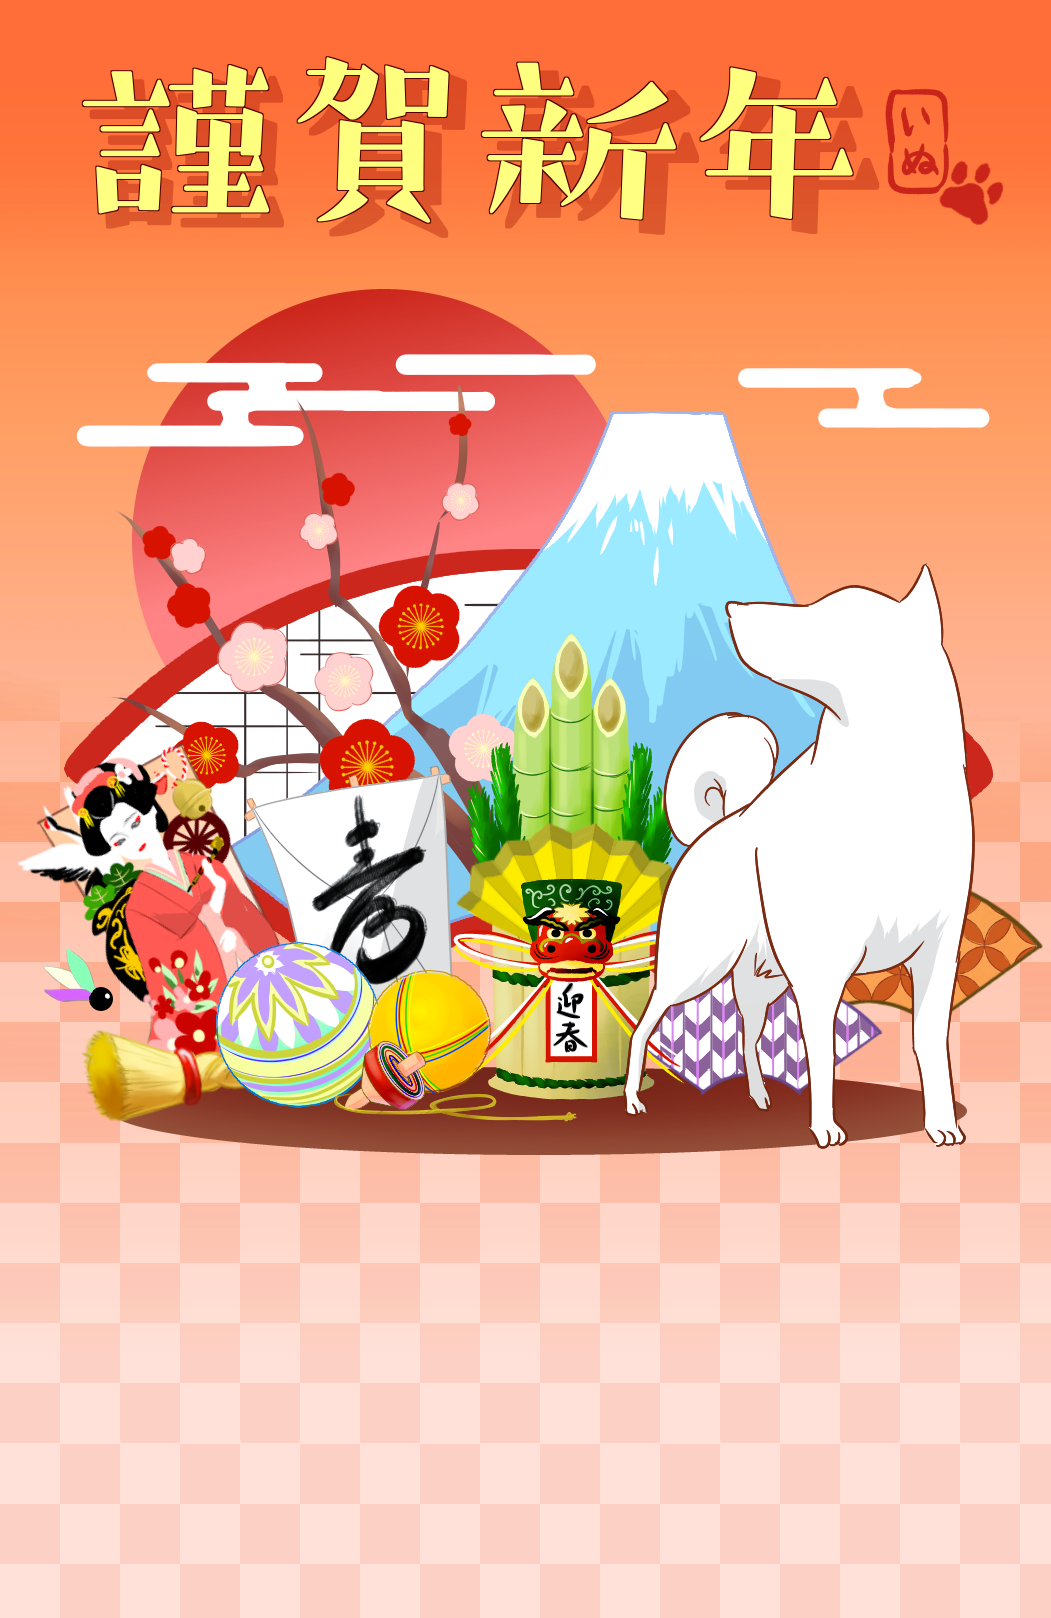 taro3ppi.0122/遊びづくし2018